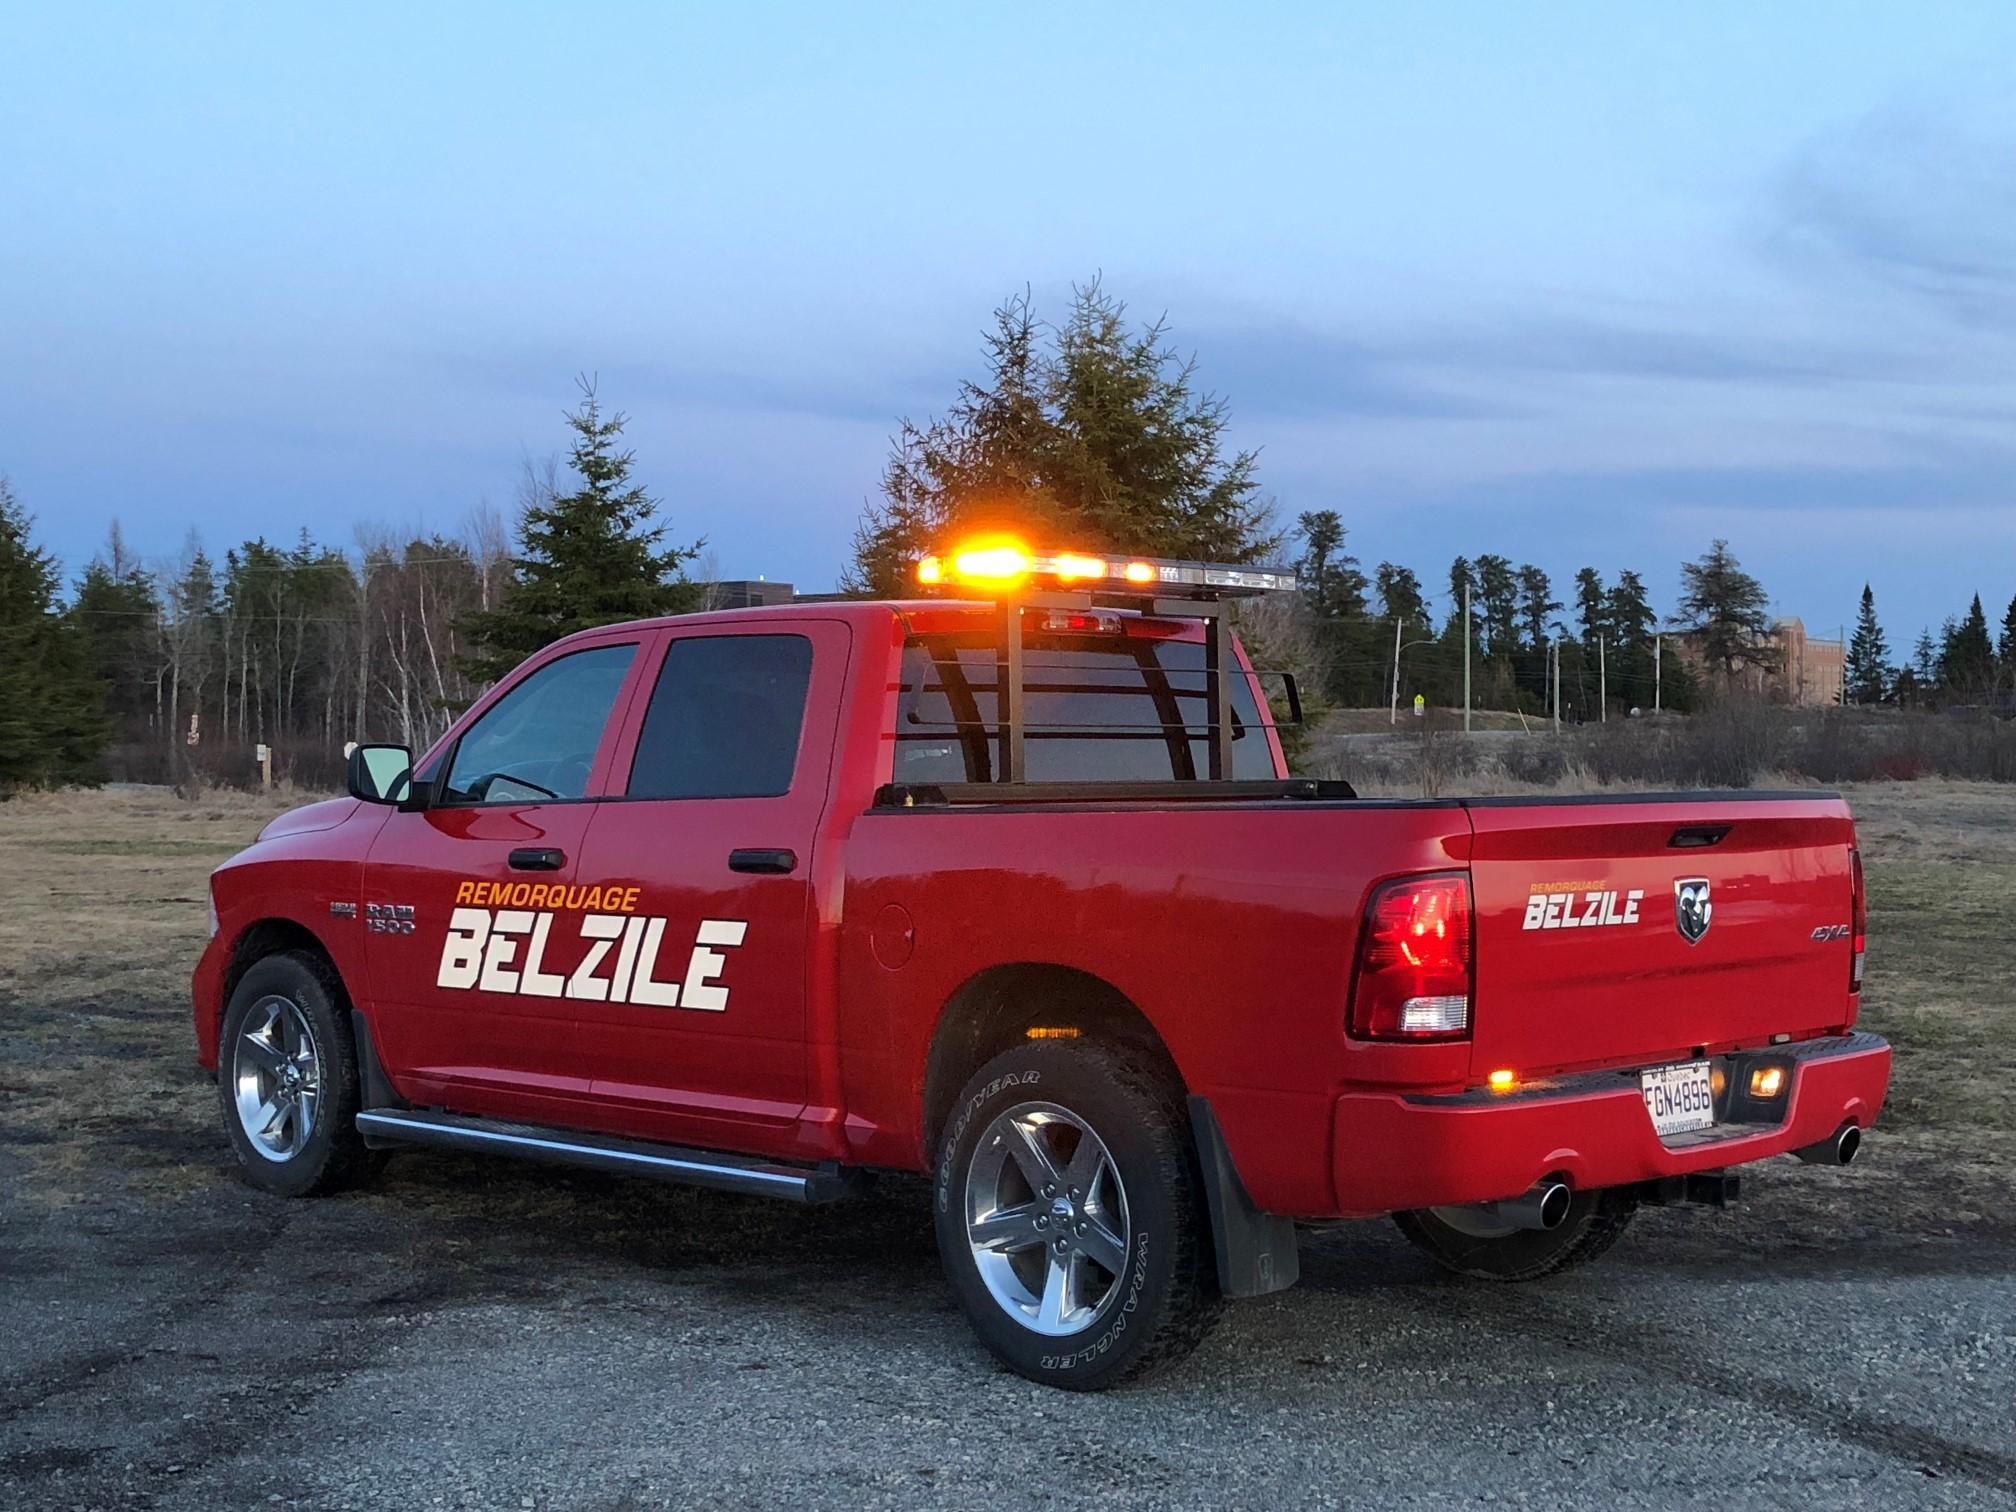 Service descorte routière (Pilot car service) en Ontario